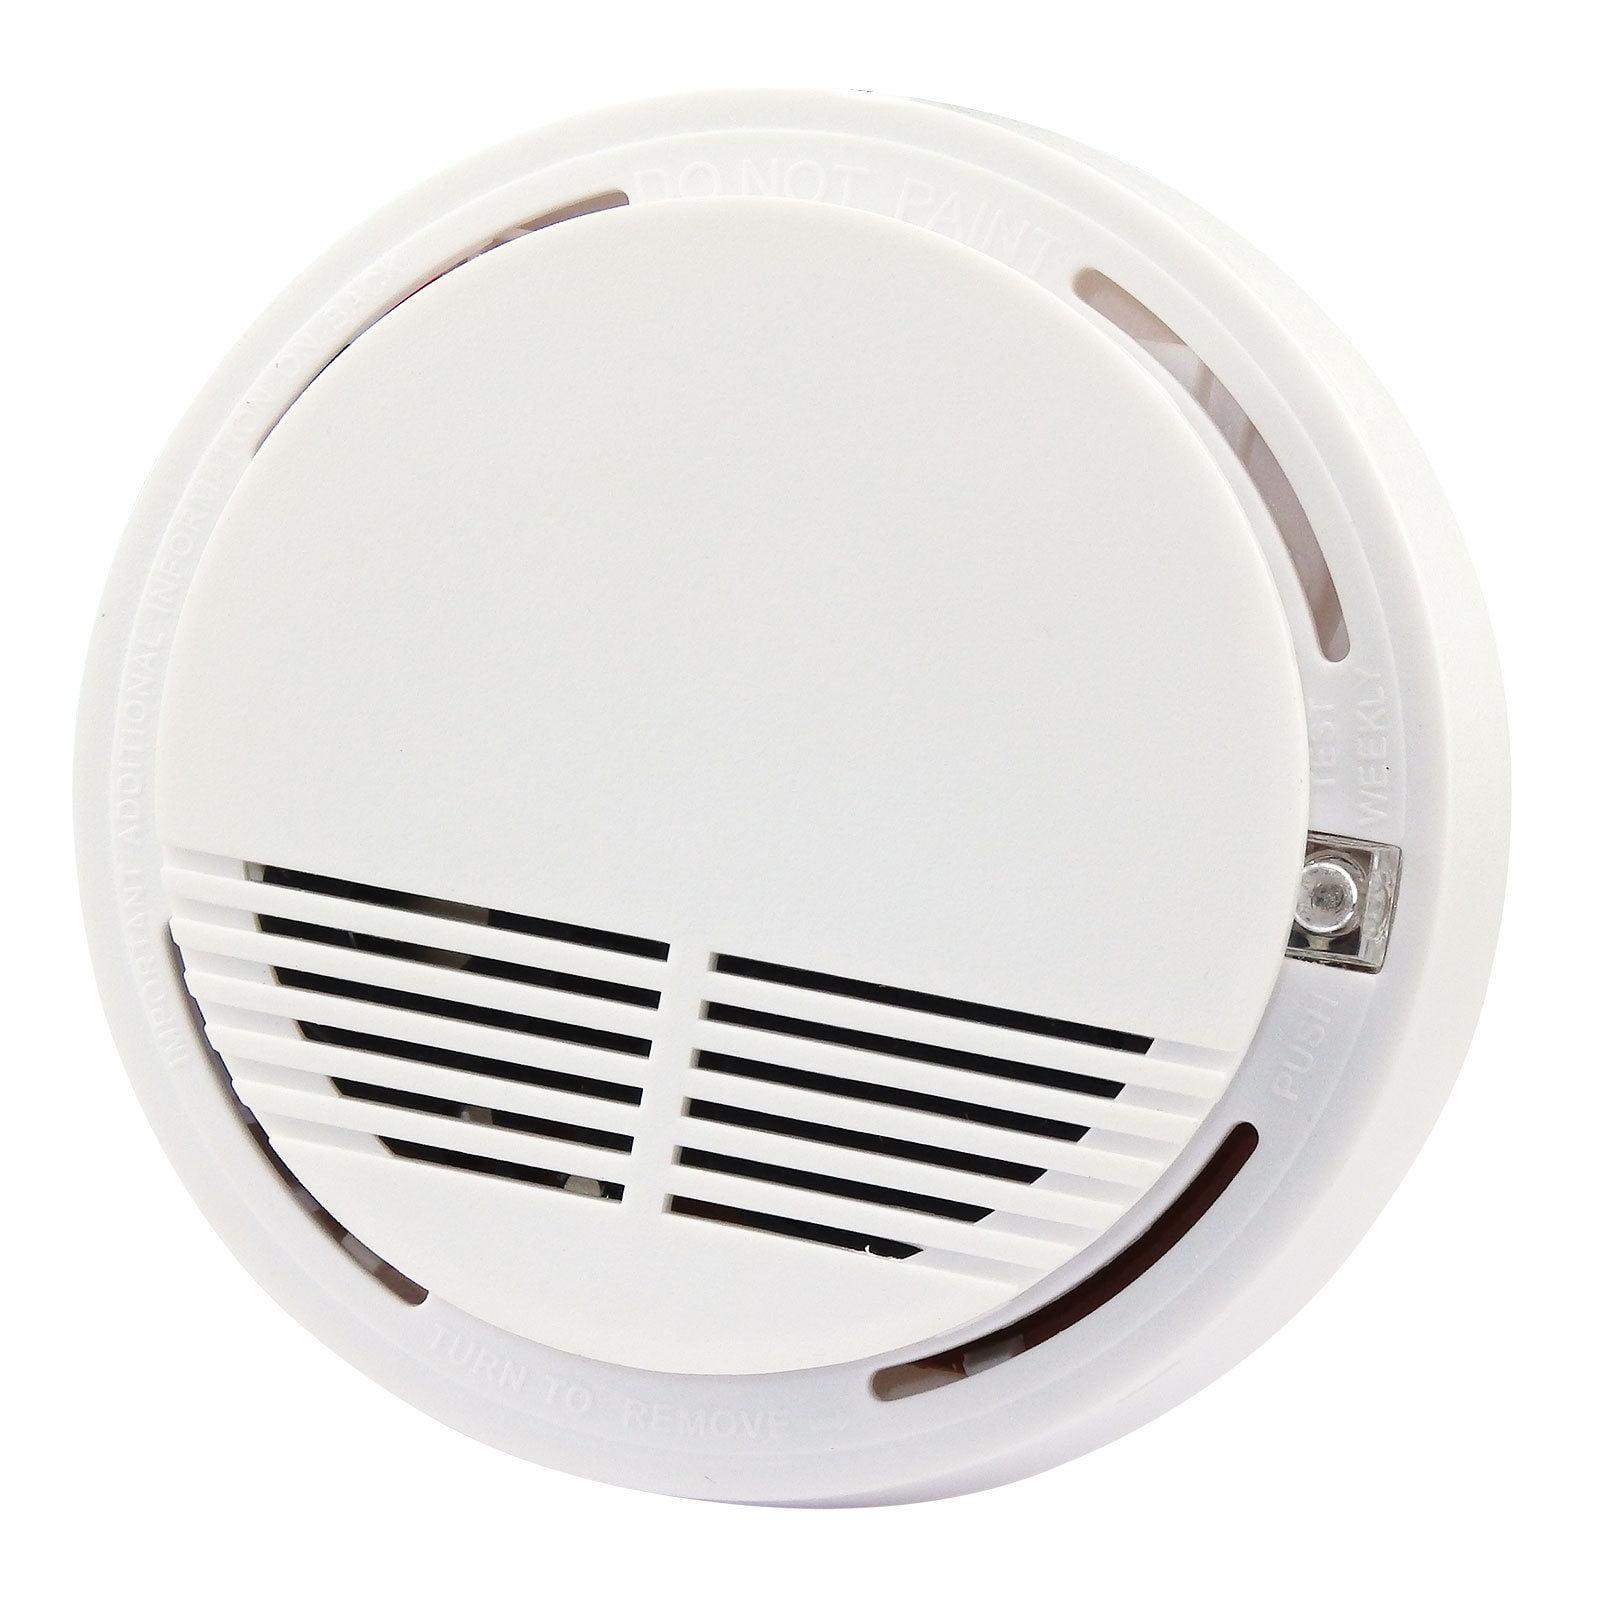 TekDeals Wireless Smoke Detector Home Security Fire Alarm Sensor System Cordless